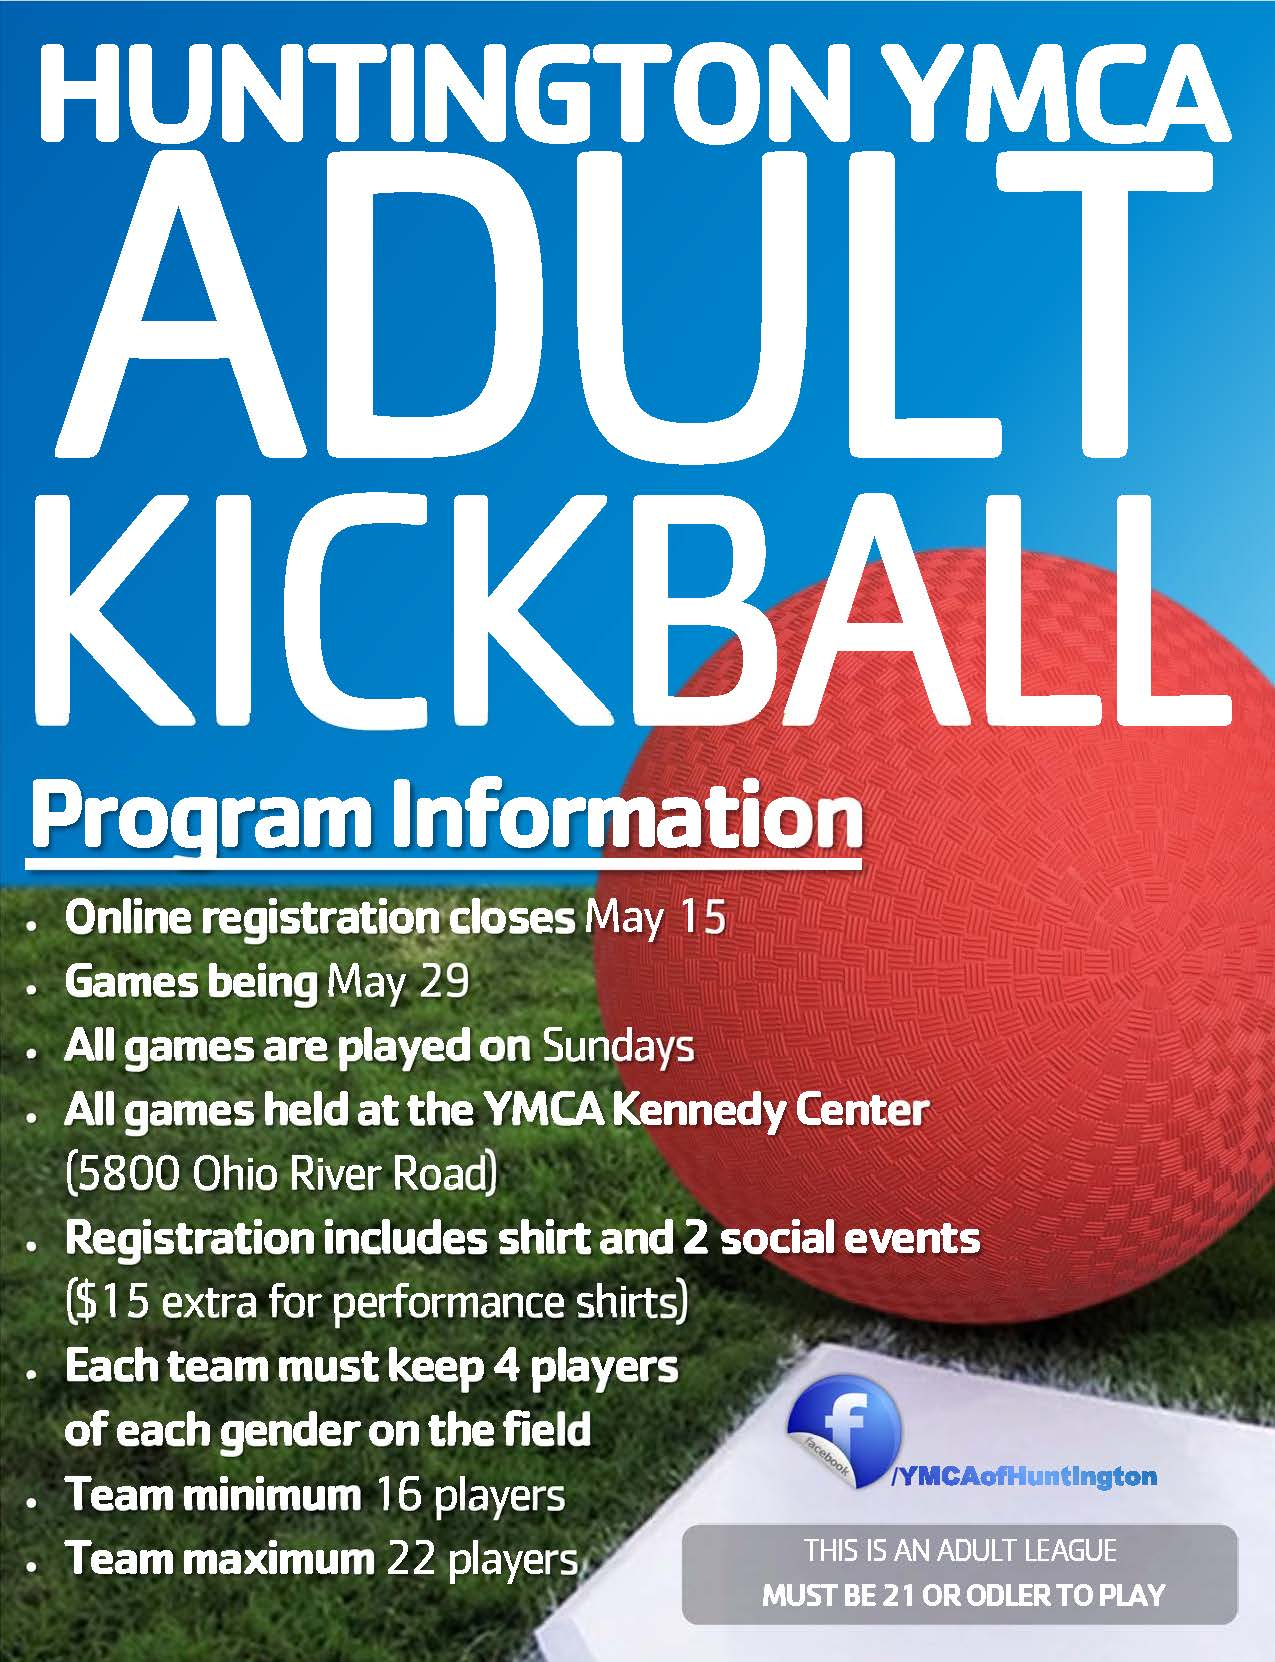 Kickball with info flyer 2016 jpeg